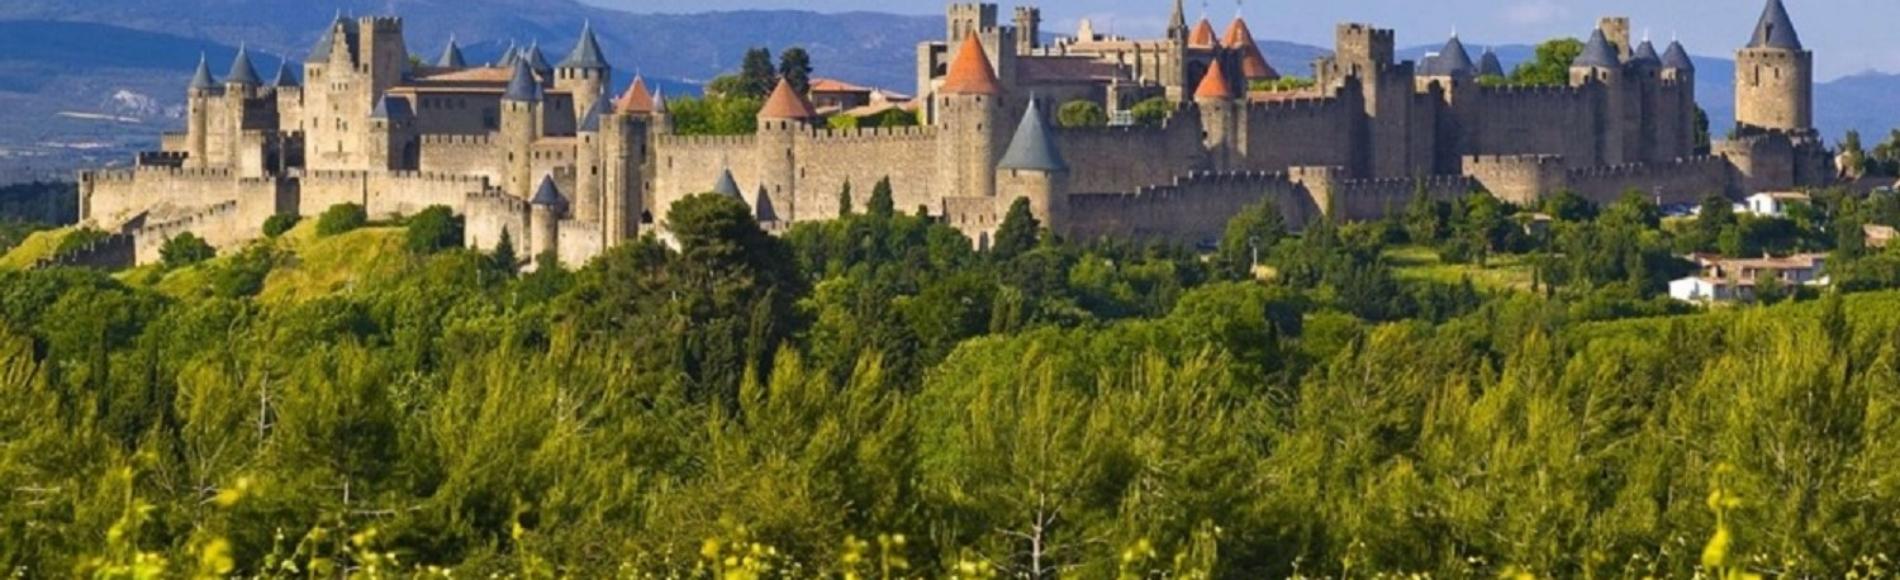 1200x768_cite-carcassonne (2)